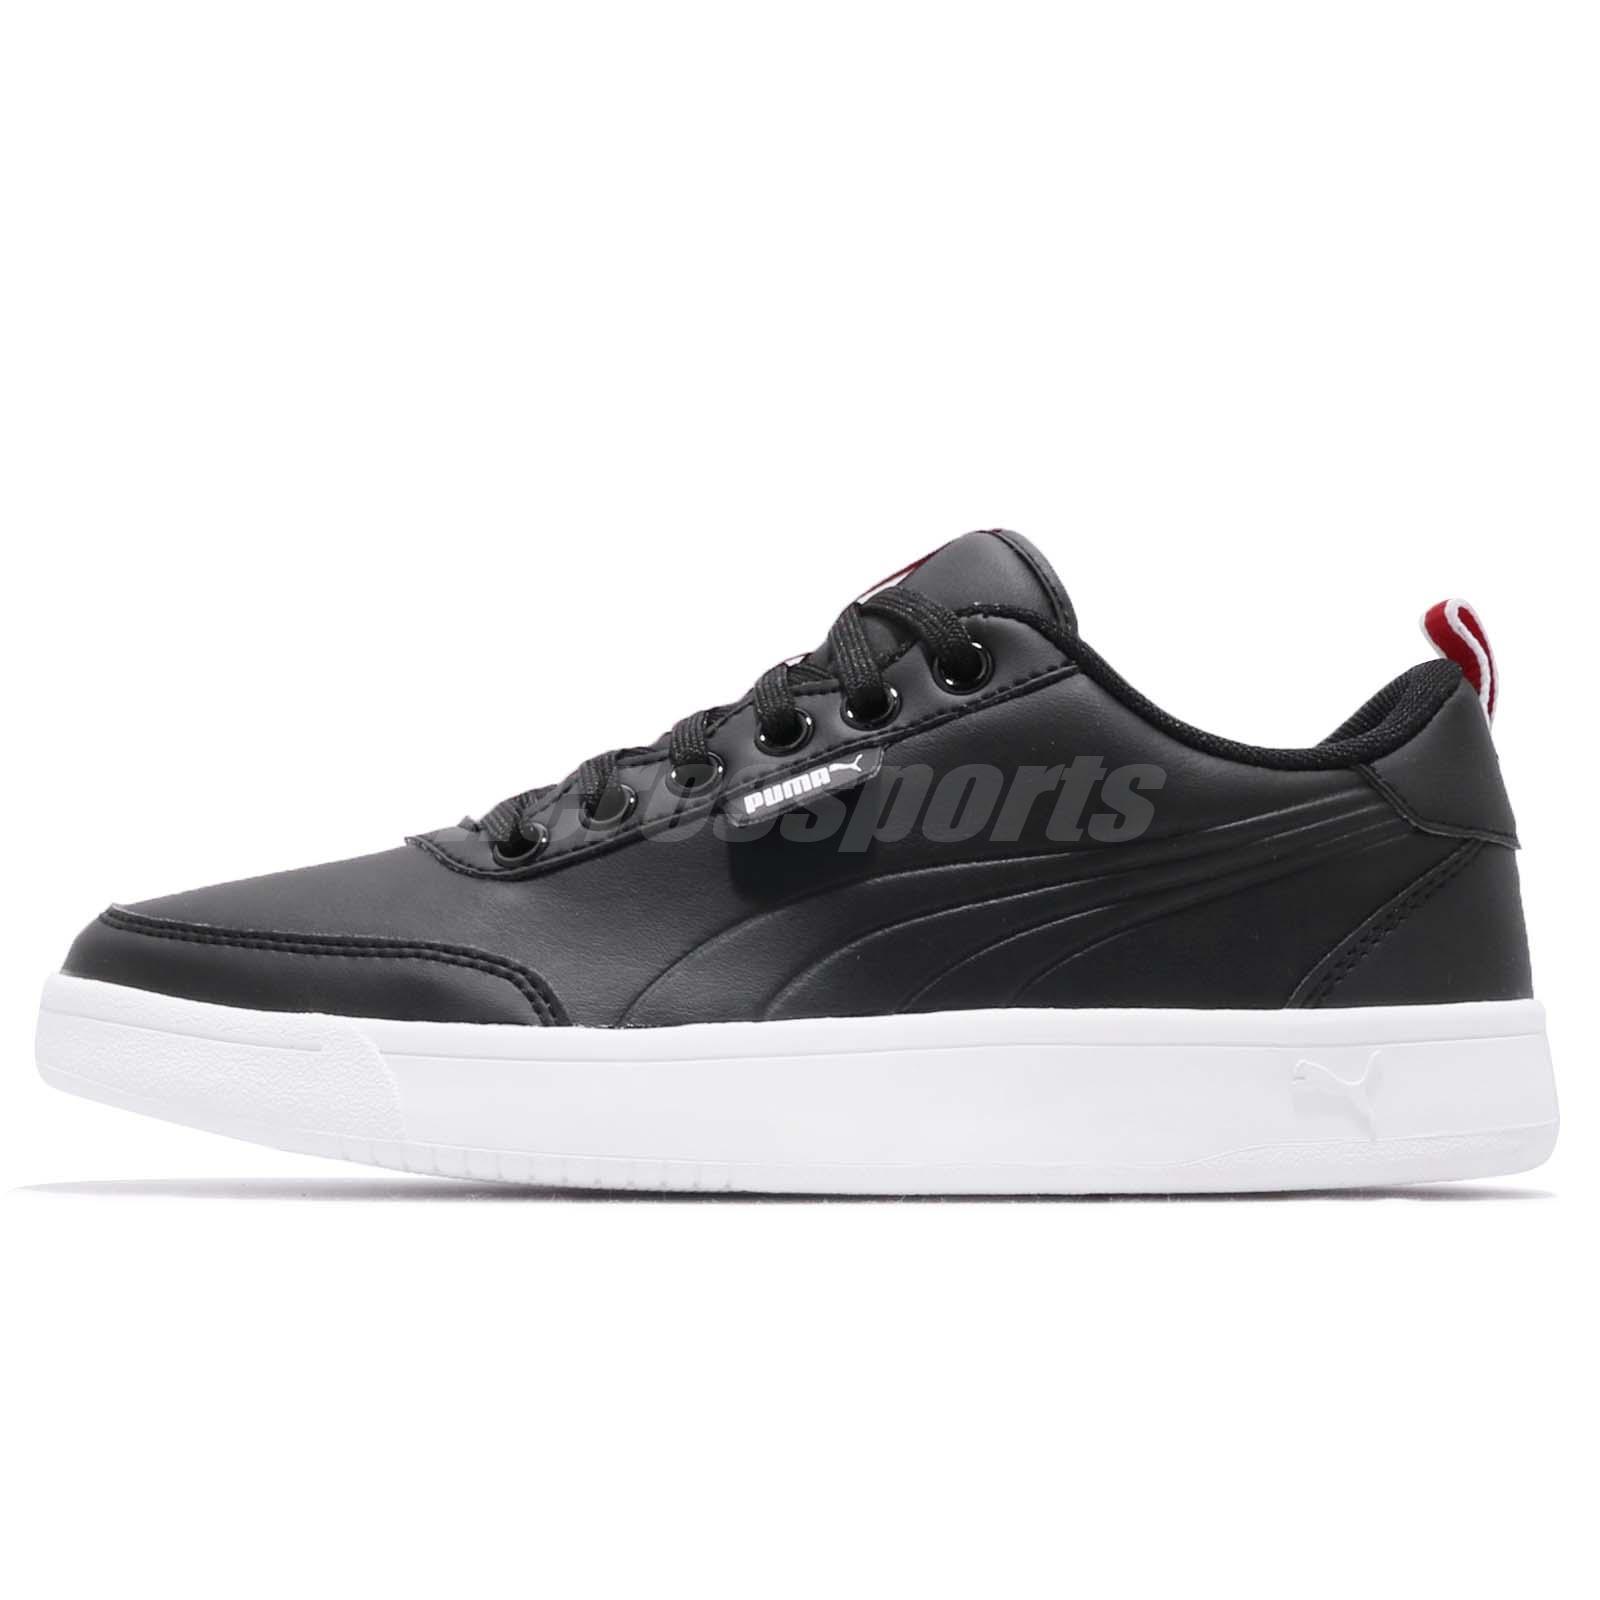 00362533cab Puma Court Breaker Flag Black Red White Mens Womens Athletic Shoes 366817-02